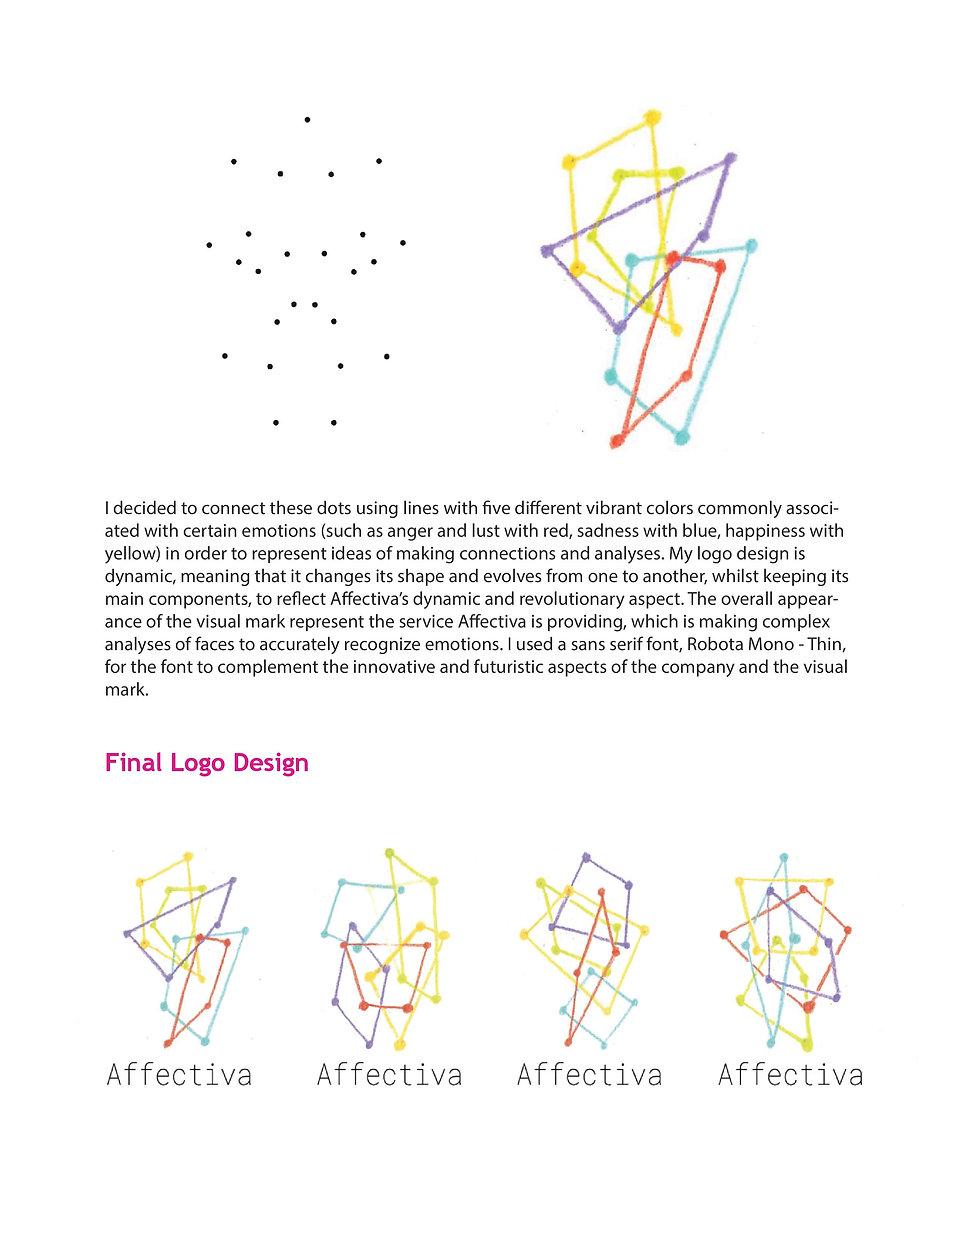 KP_DesignChallende-page-002 (1).jpg